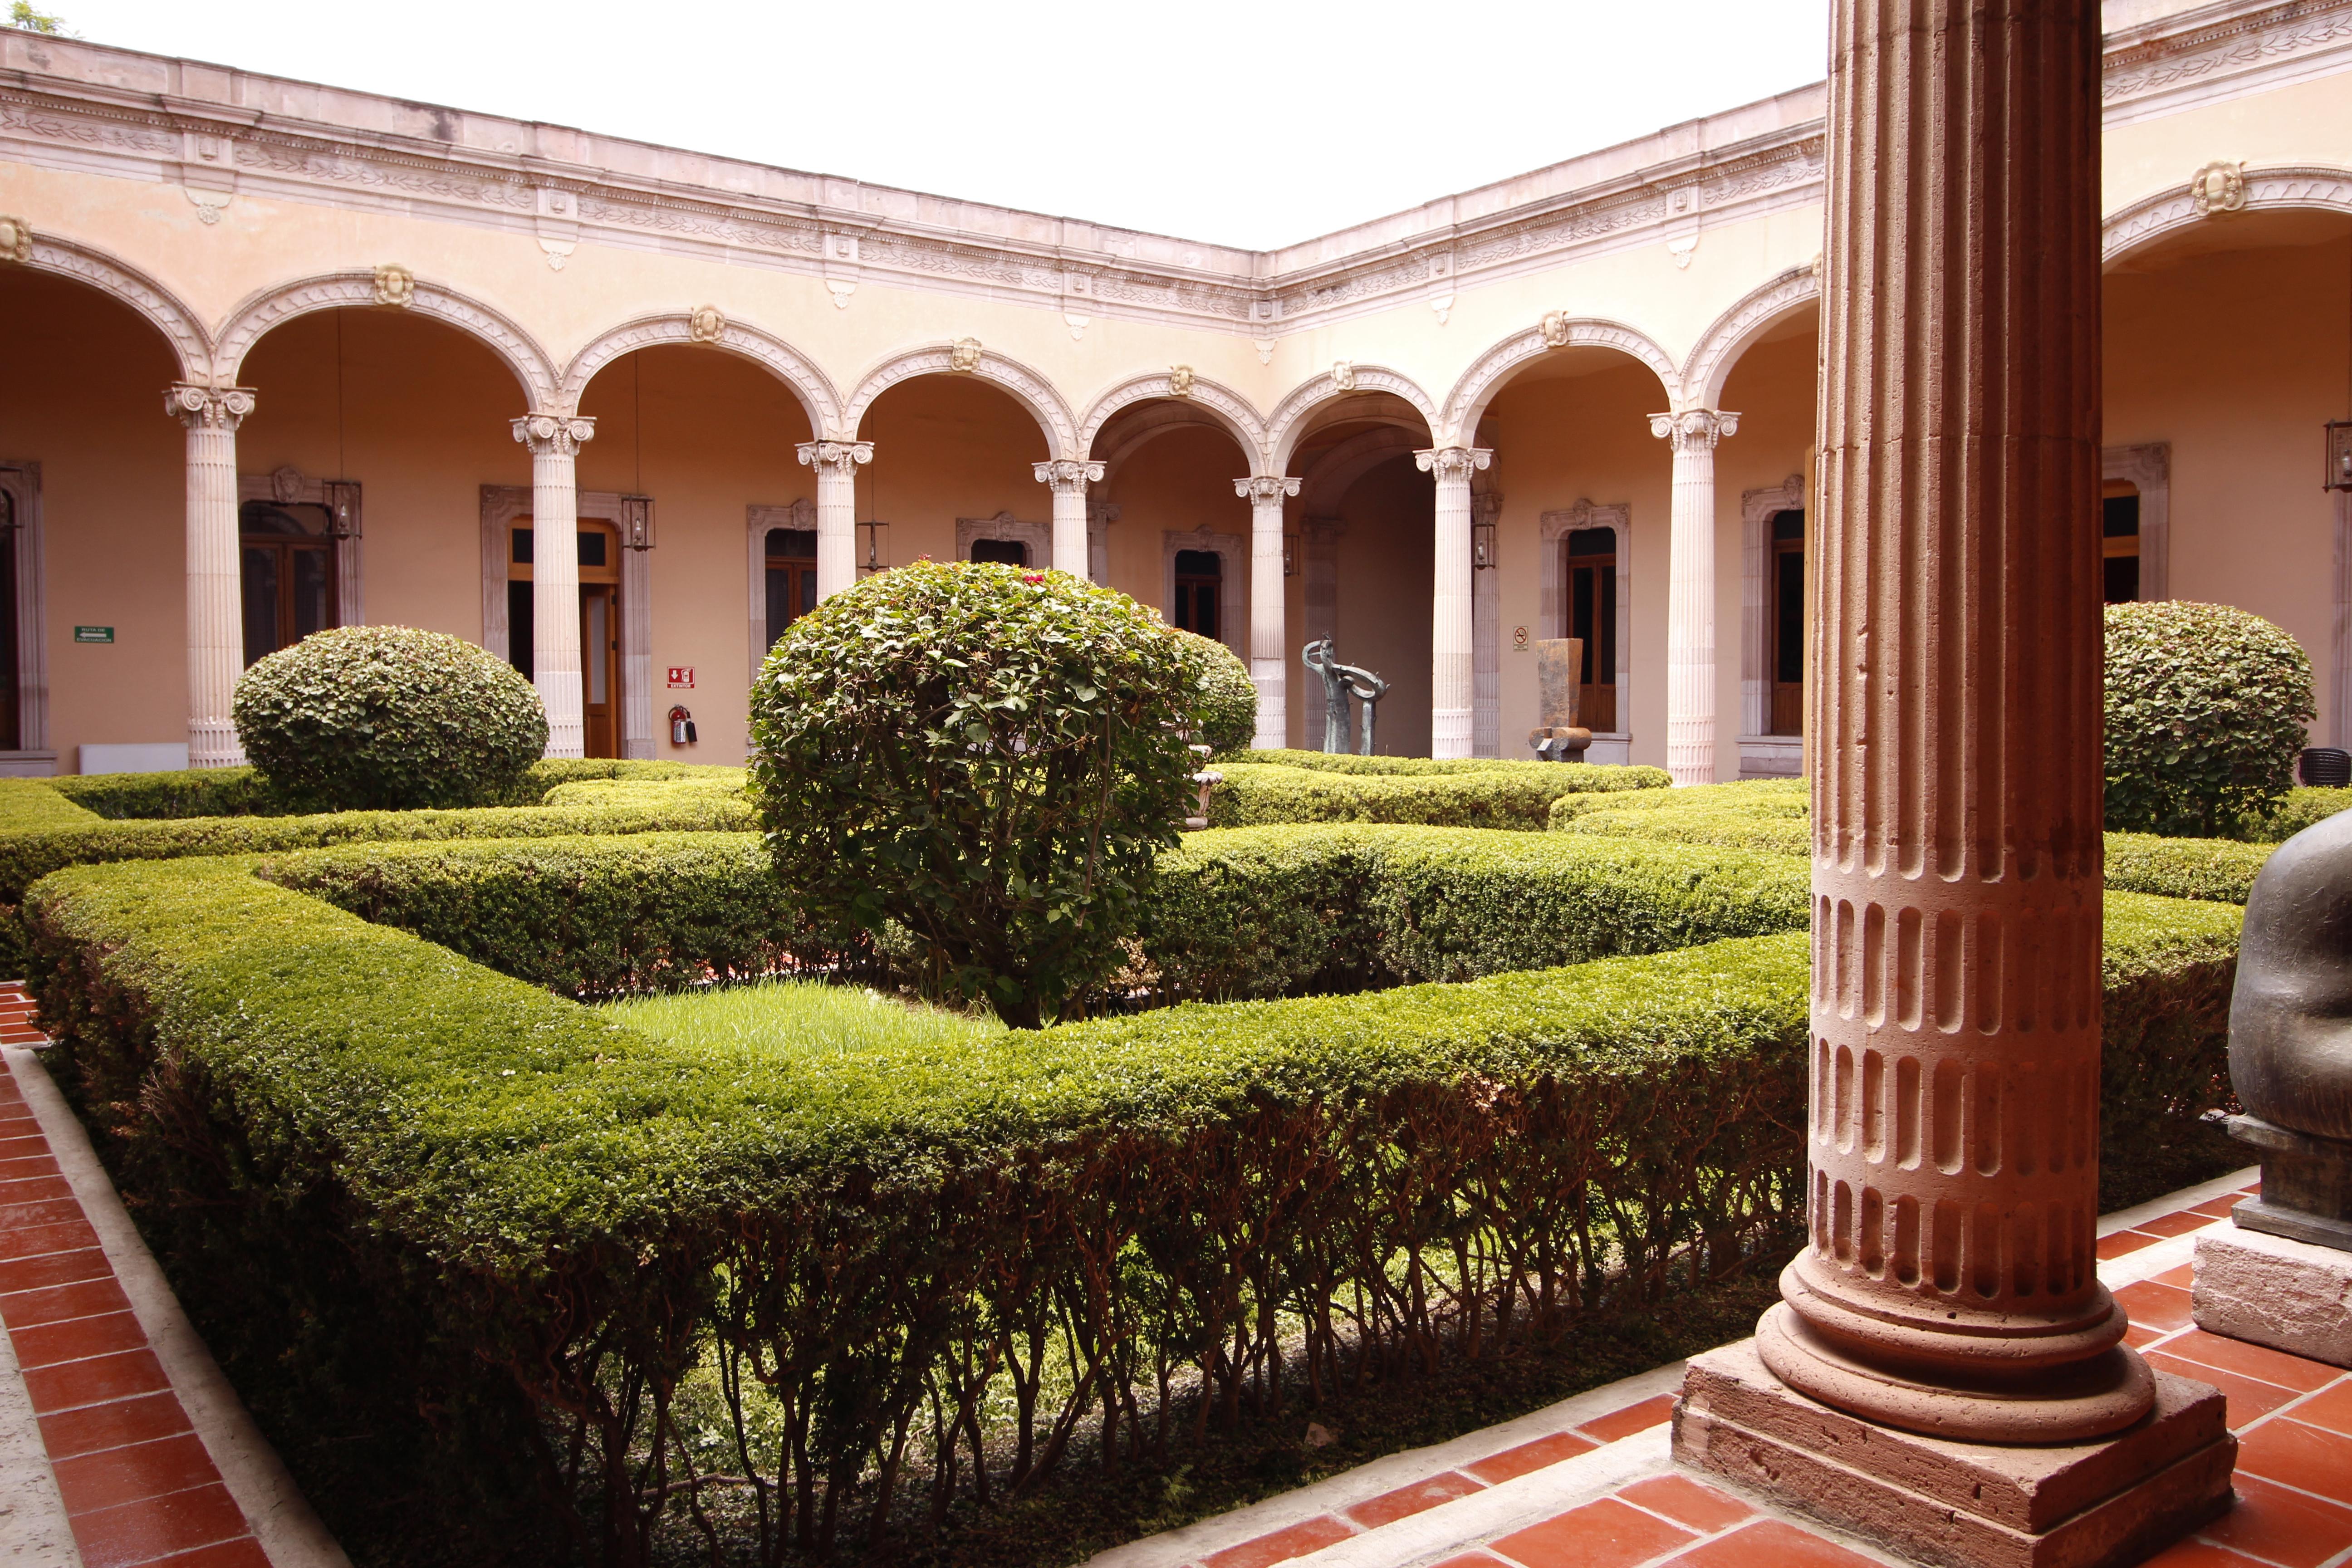 File:Jardin Museo de Aguascalientes.jpg - Wikimedia Commons